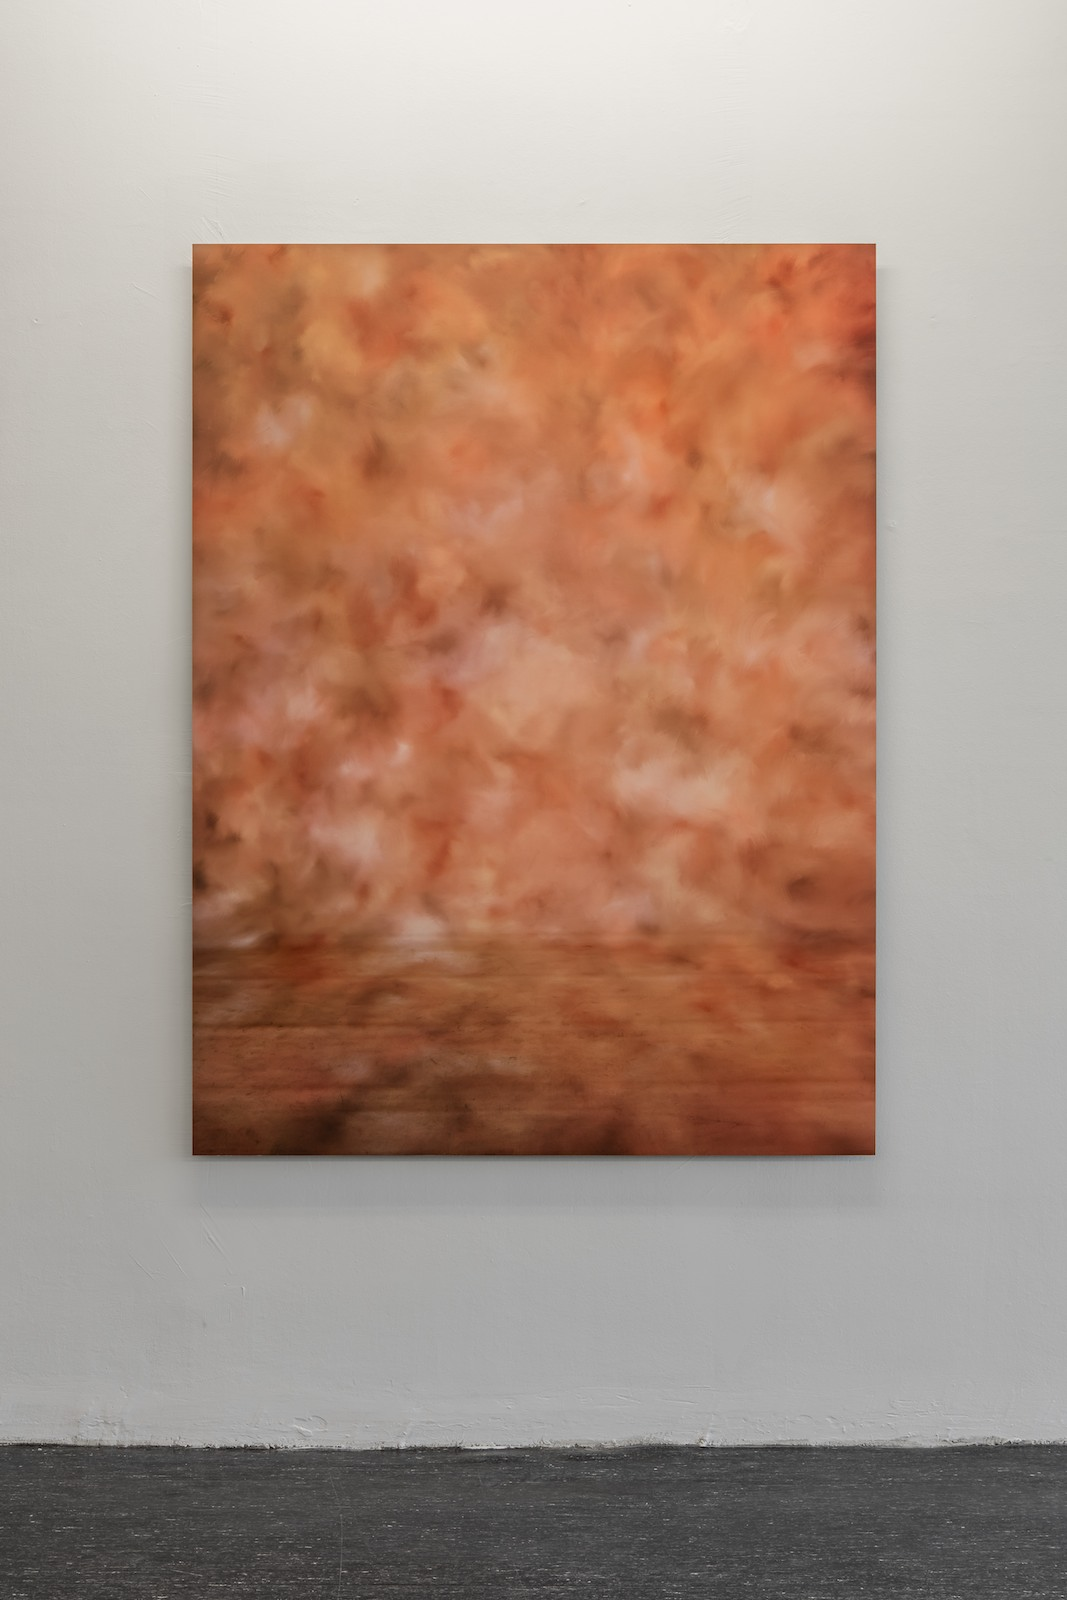 Maränger, 2016, pigment print mounted on aluminium, 148,5 x 111,3 cm, ed. 5